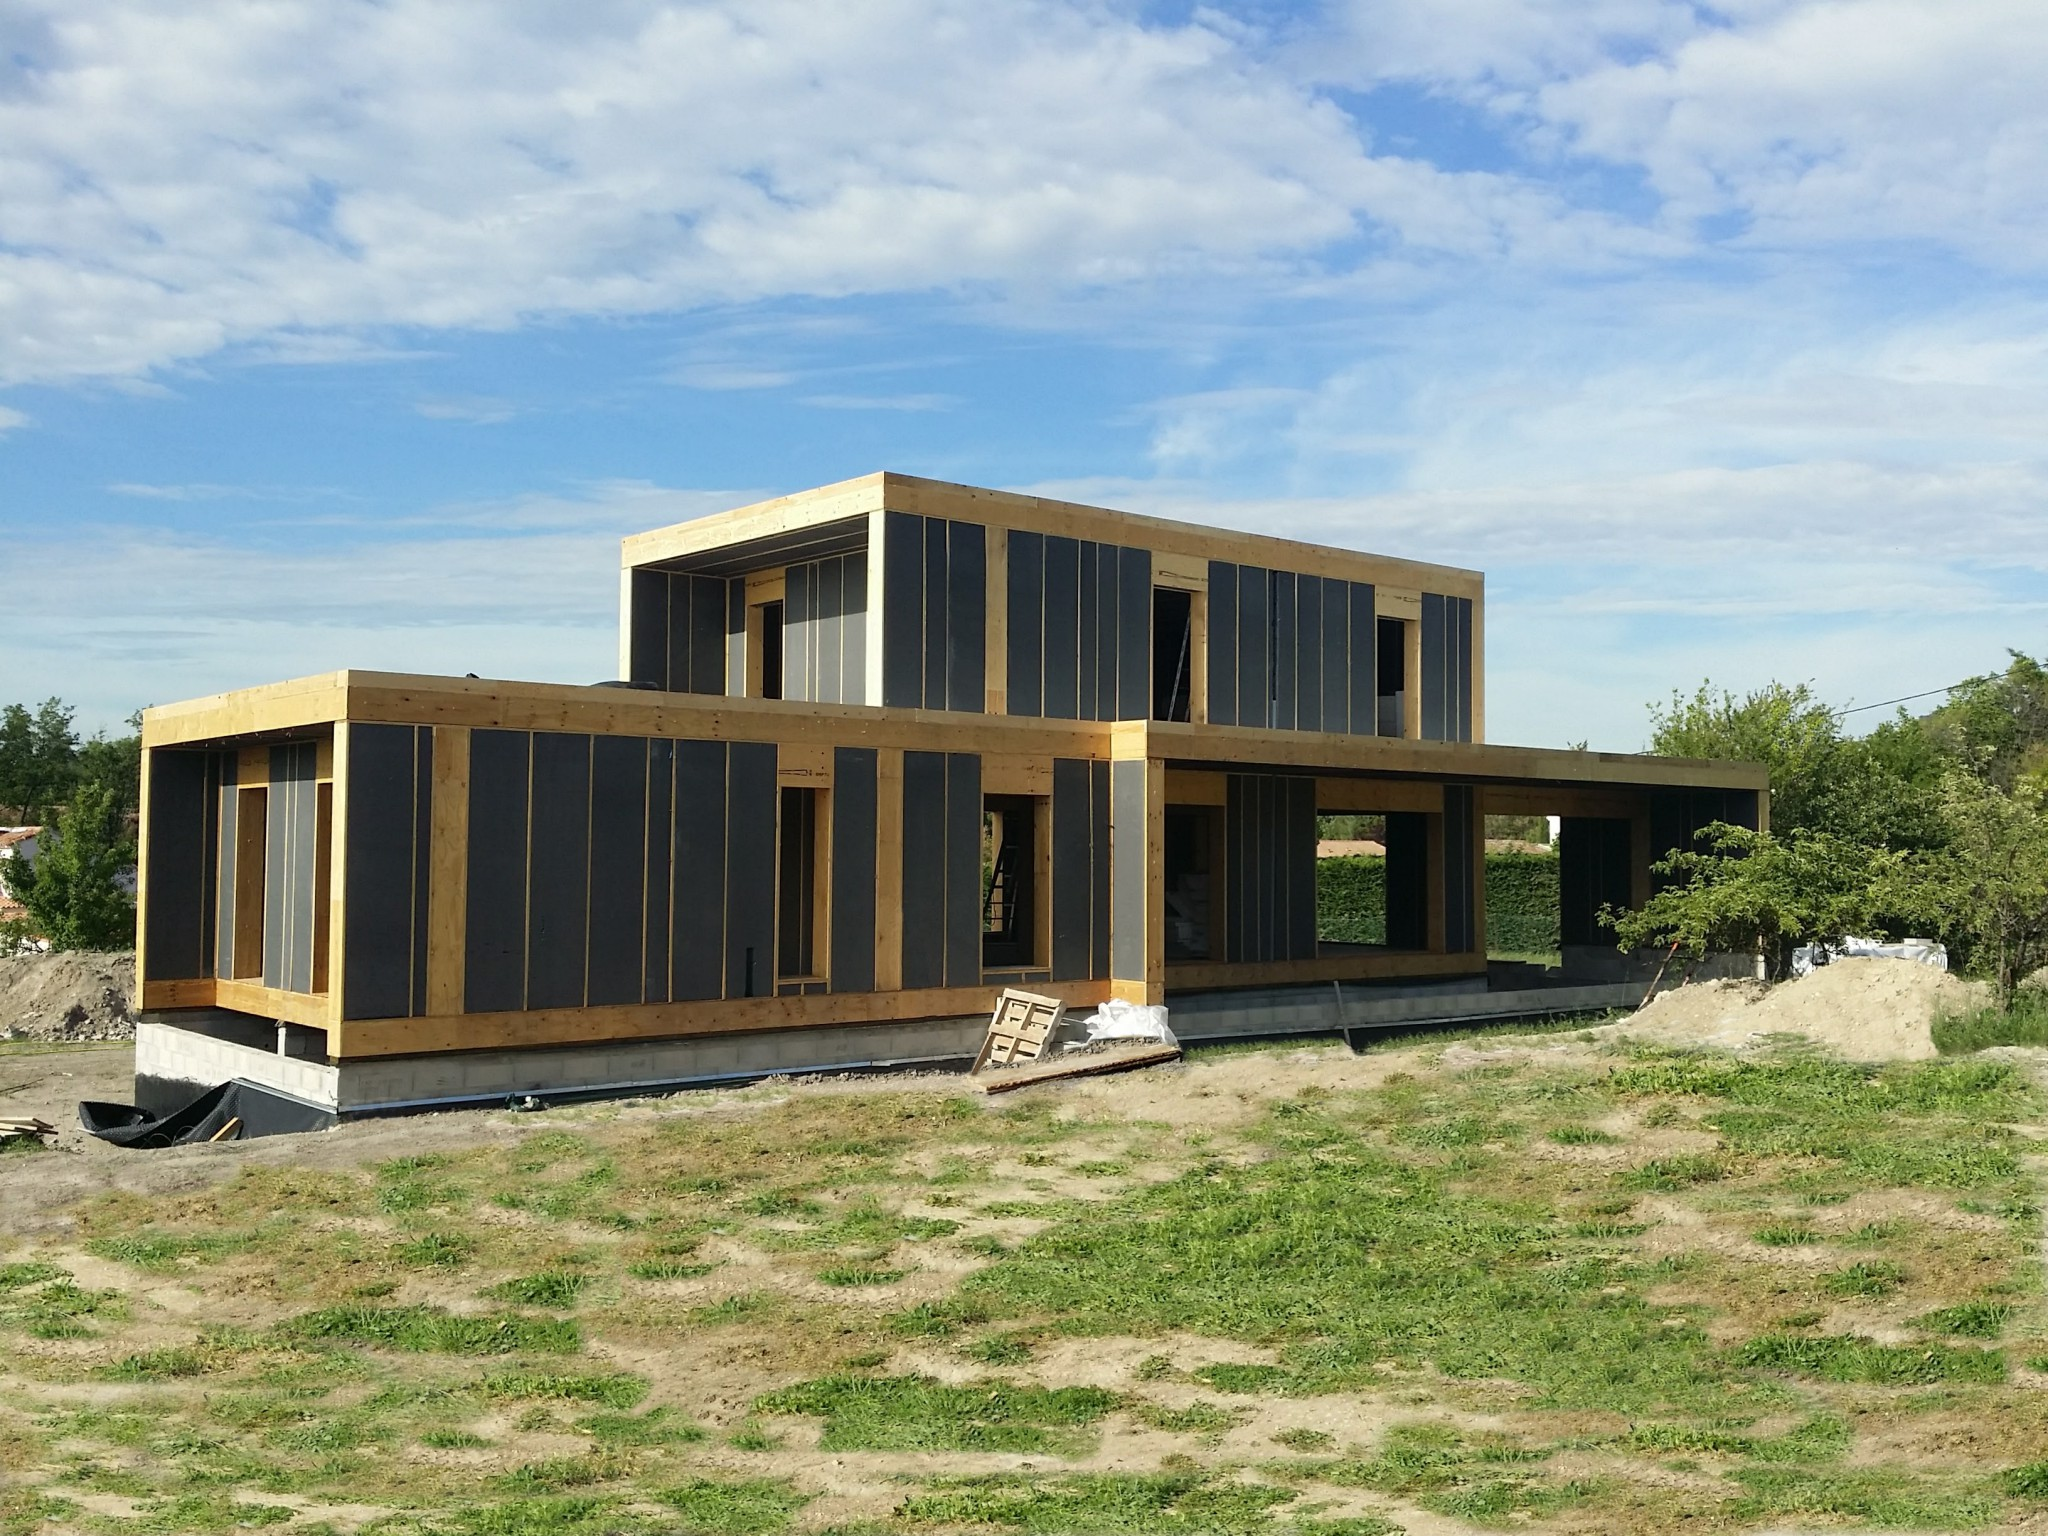 Maison container bretagne latest maison container for Container maison passive